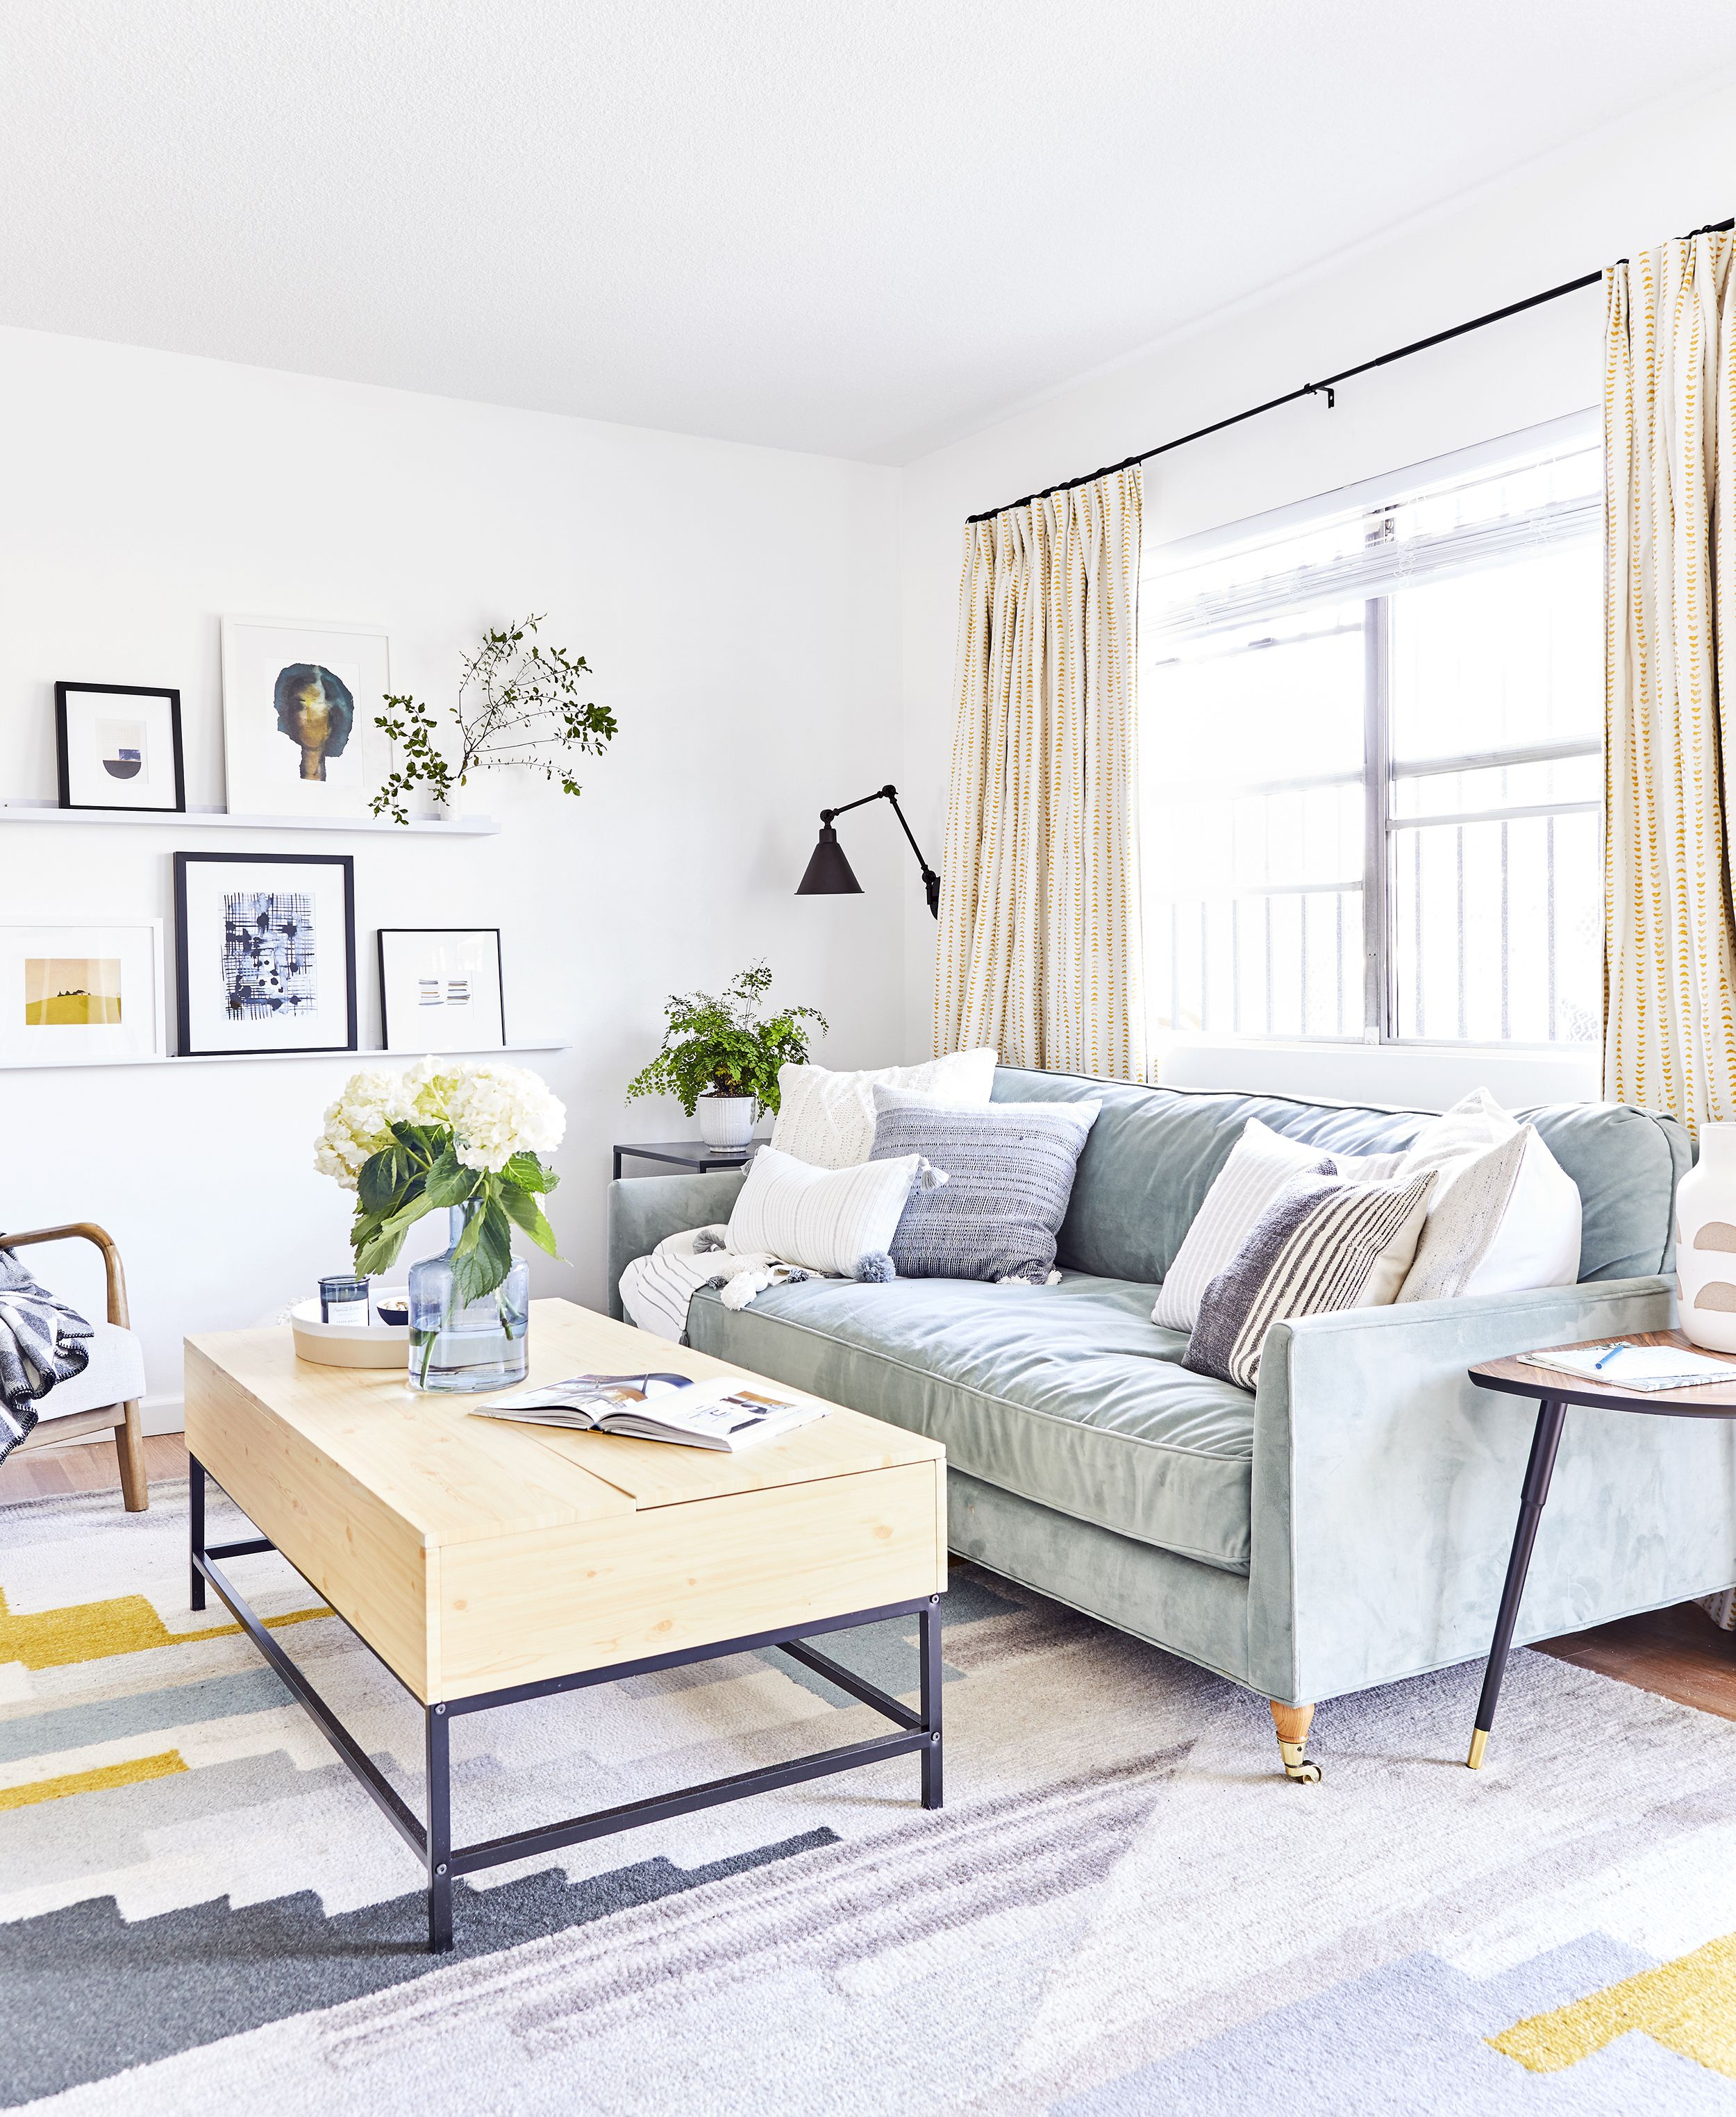 How to Furnish a Living Room - Living Room Design Ideas